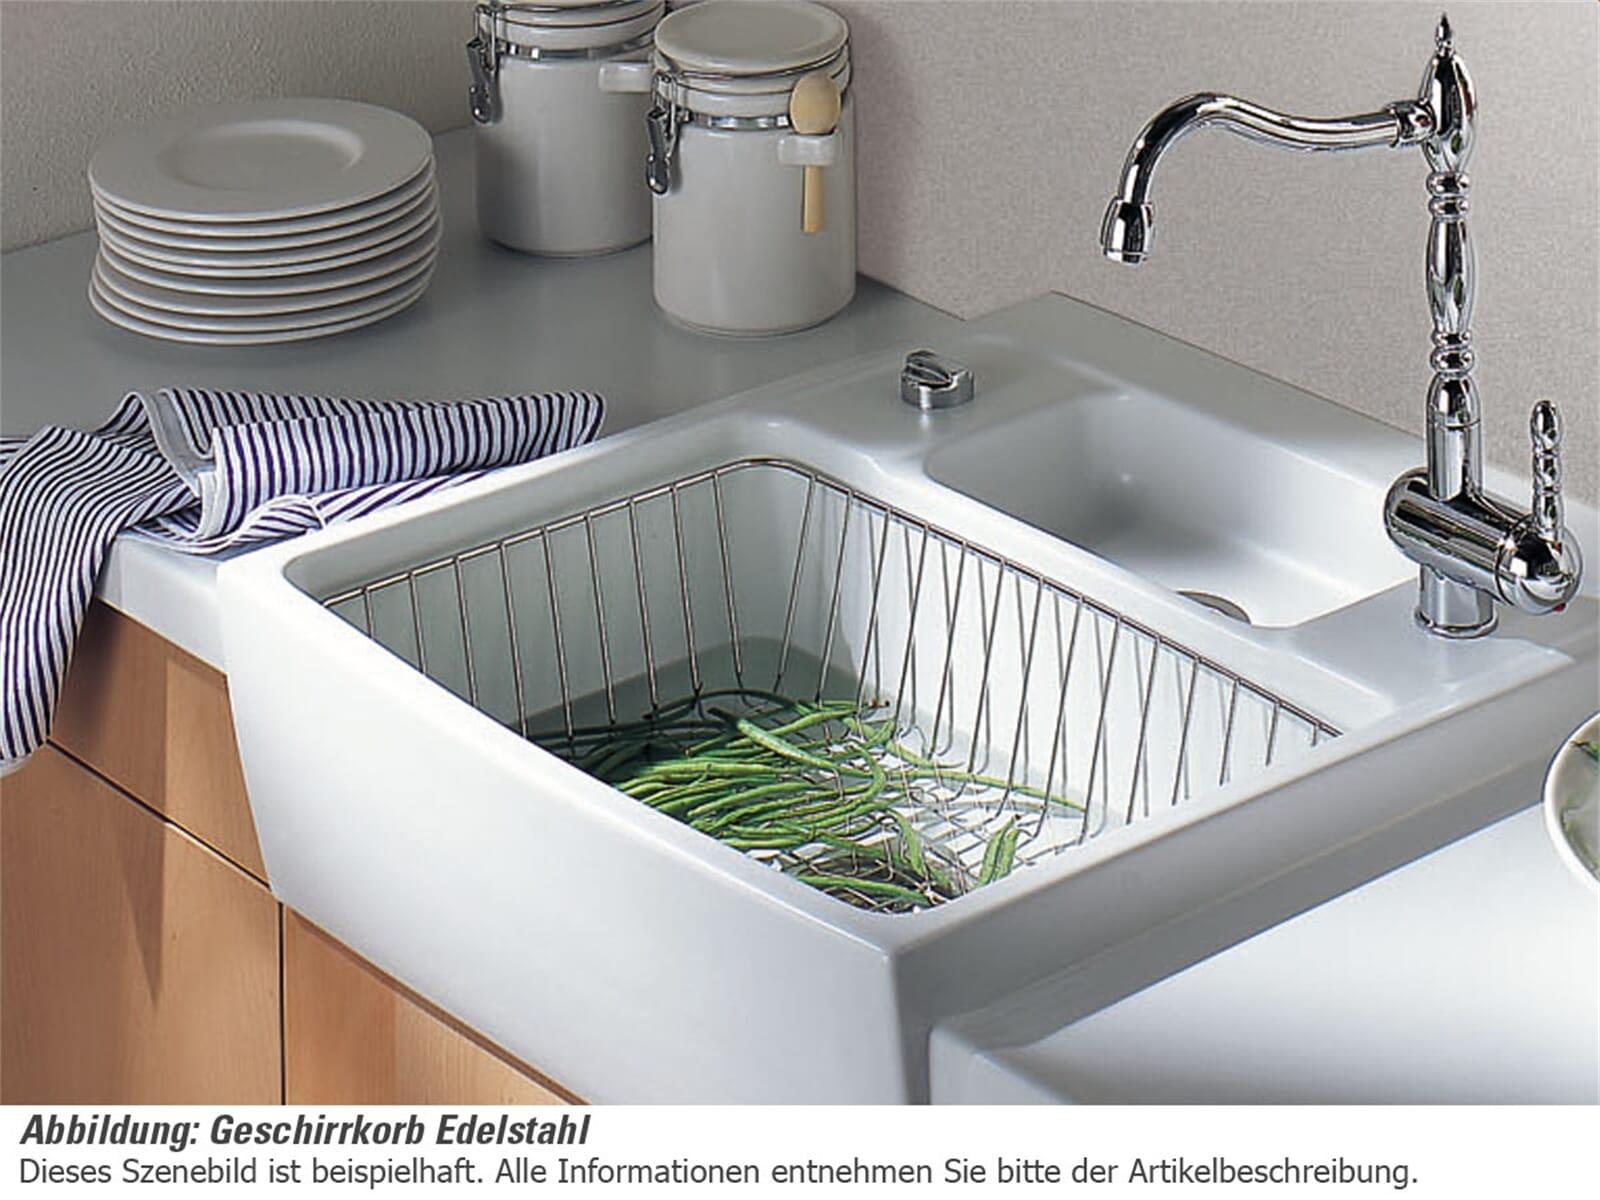 Systemceram Geschirrkorb Edelstahl 0811